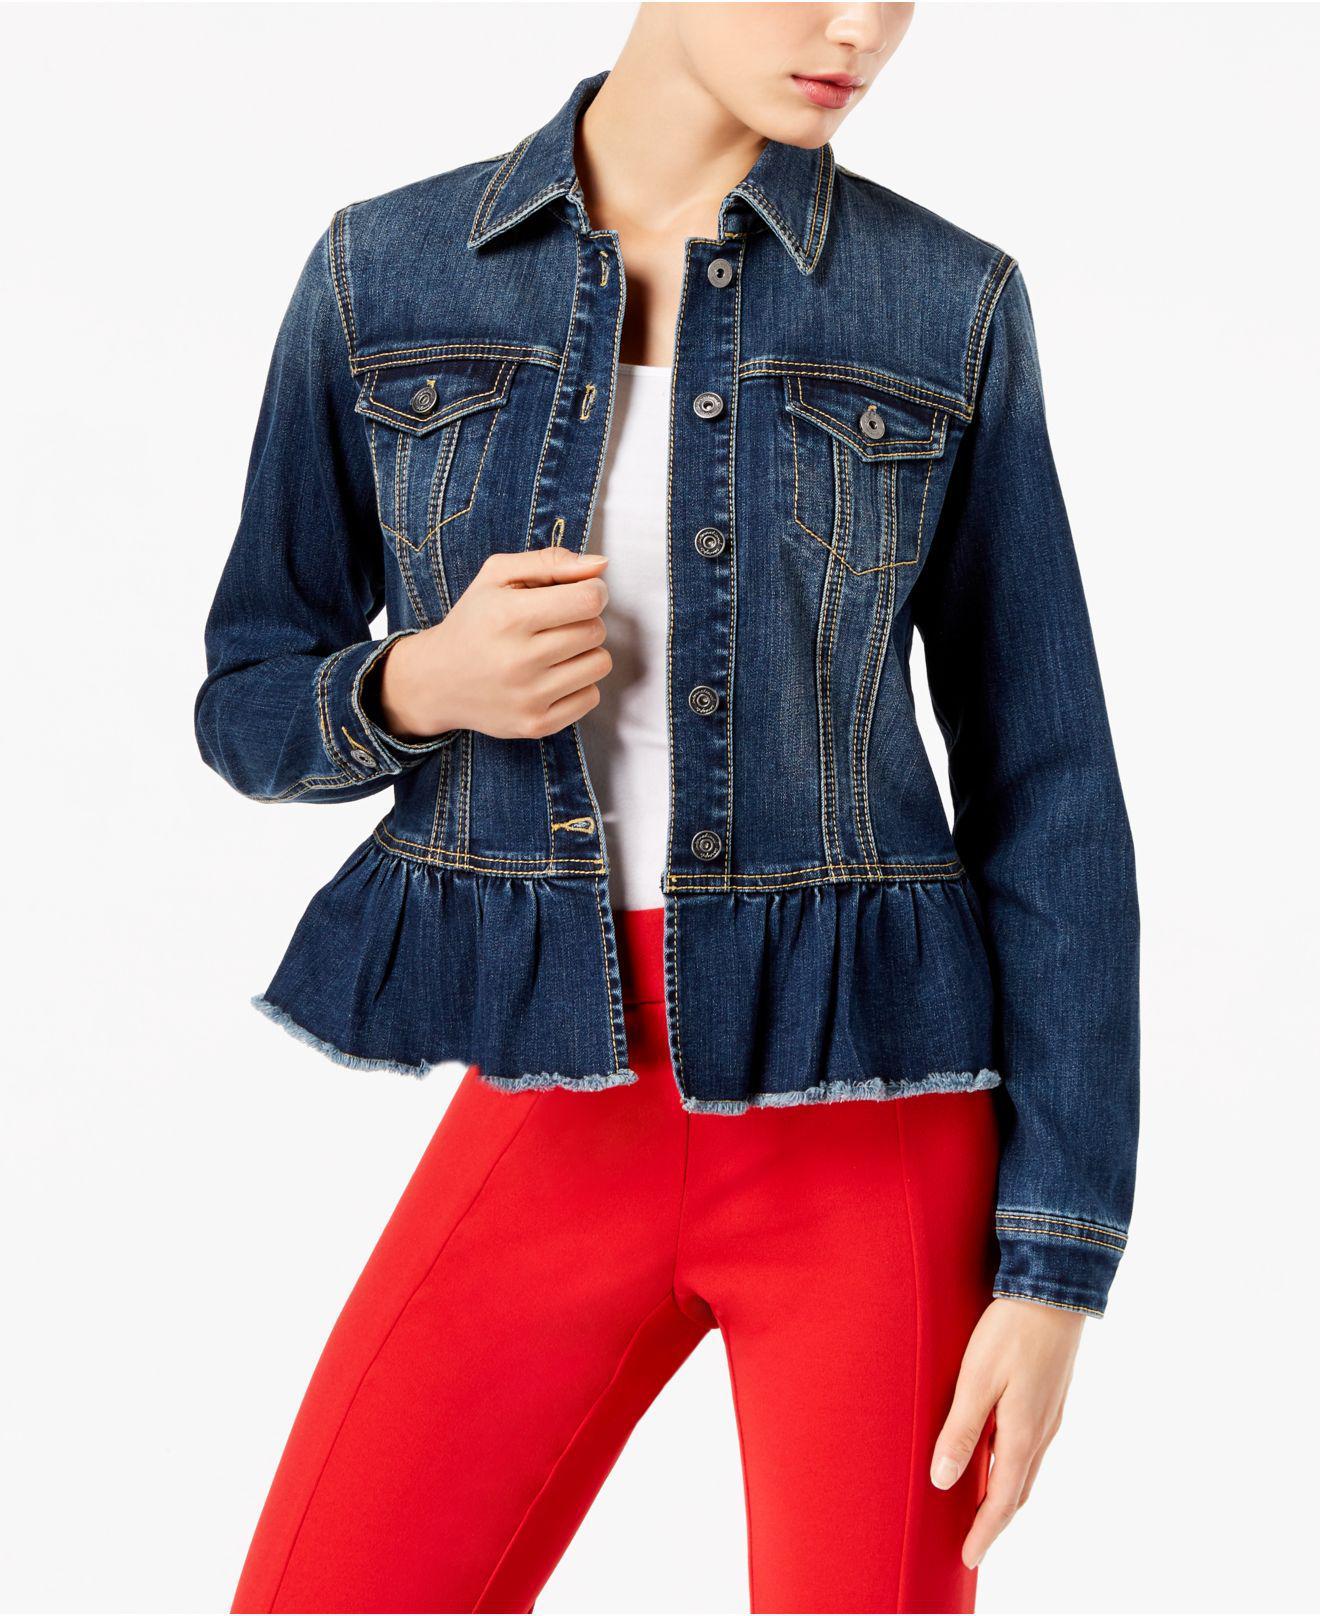 2474281e4a736 Lyst - INC International Concepts Ruffled Denim Jacket in Blue